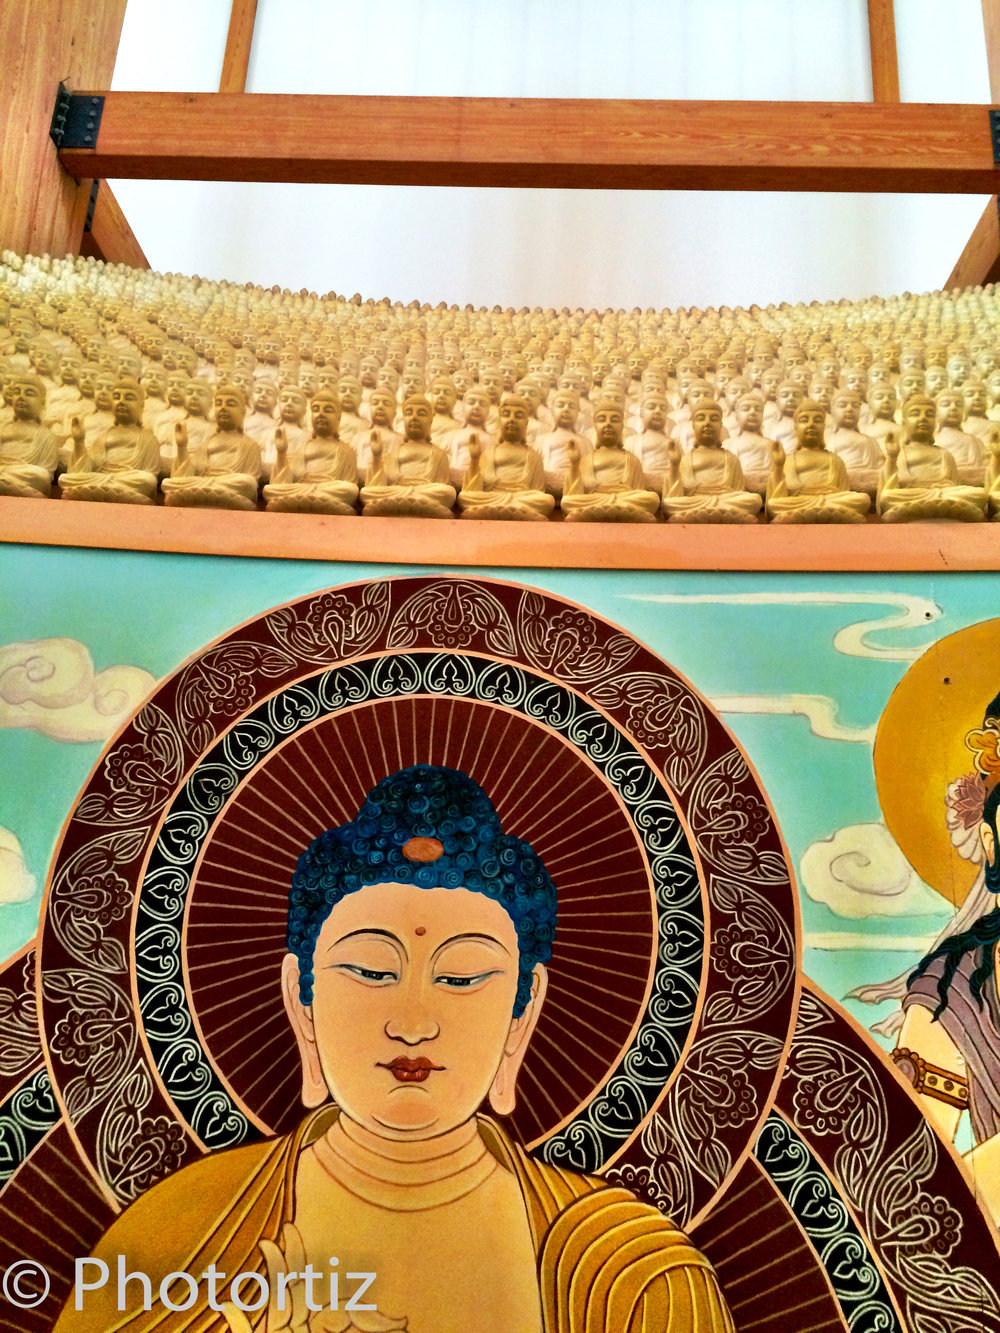 Hundreds of miniature Buddhas surround the big statue.